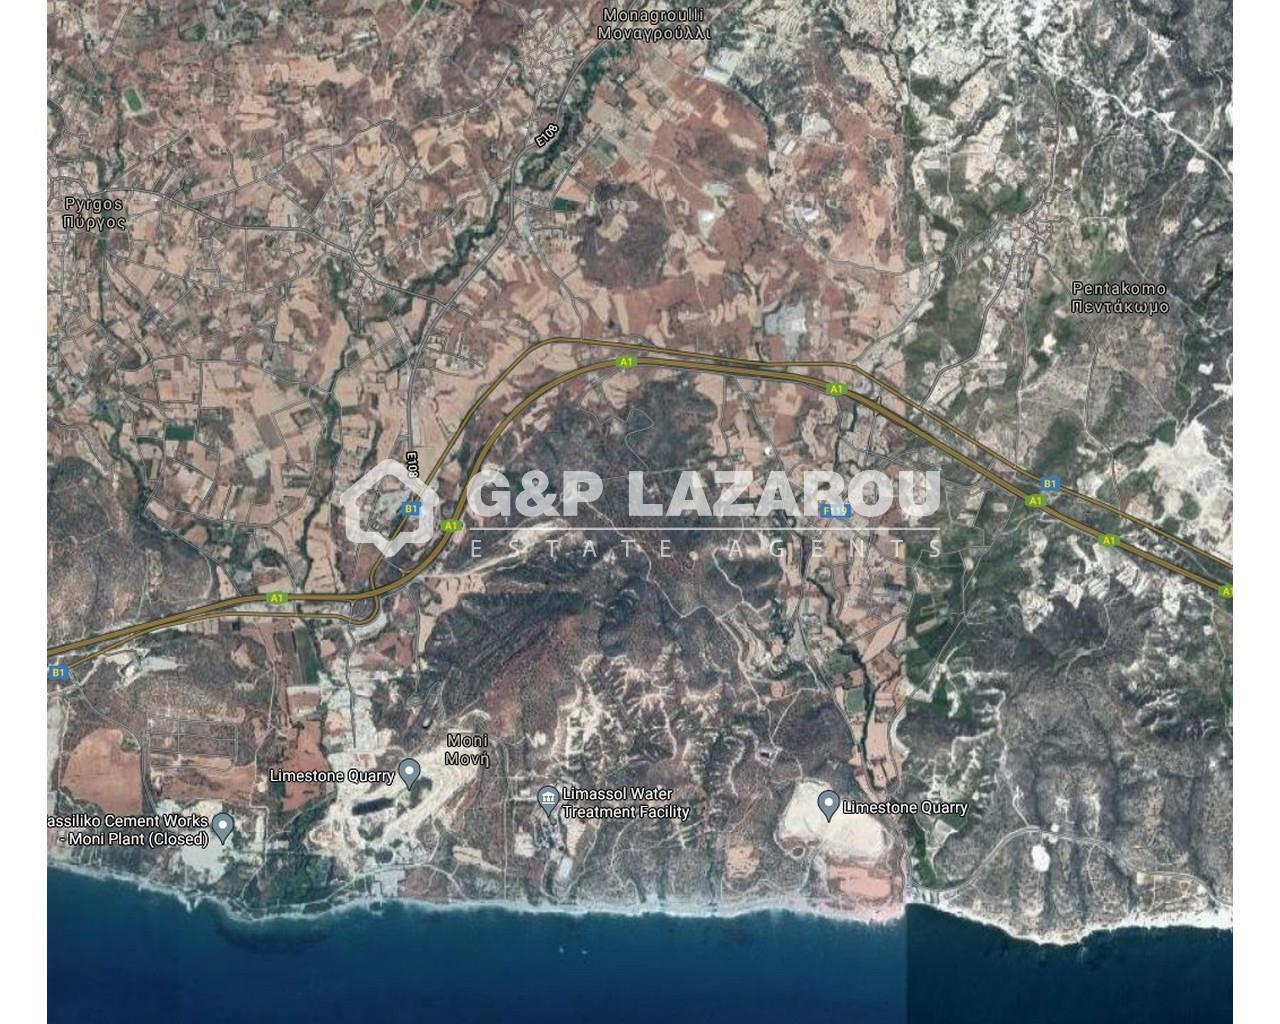 Land Limassol(Monagroulli)  3679 SqMt for sale